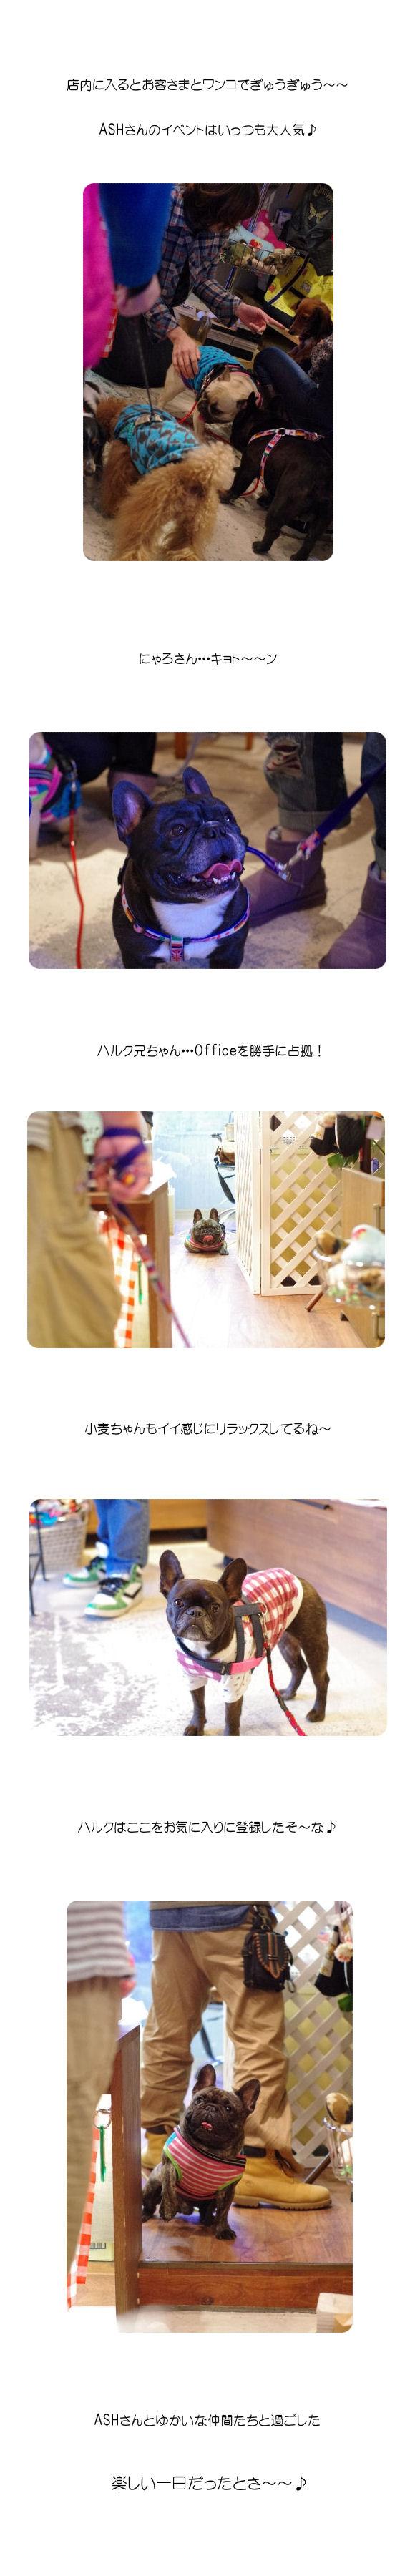 ASH秋祭りC